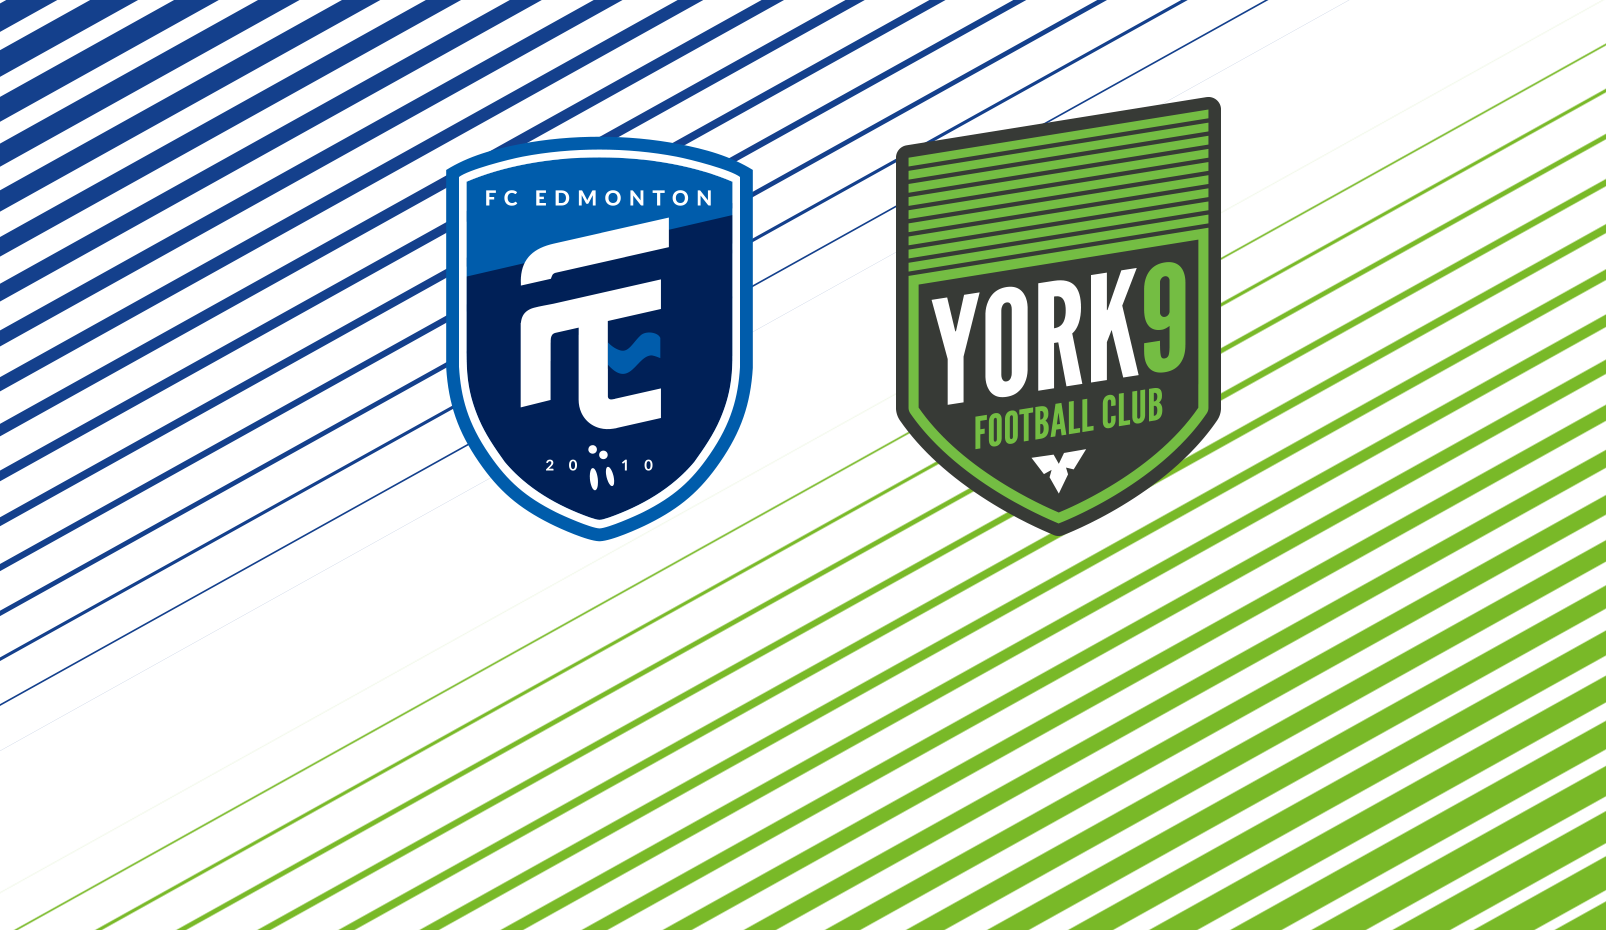 PREVIEW: FC Edmonton vs. York9 FC - Match #78